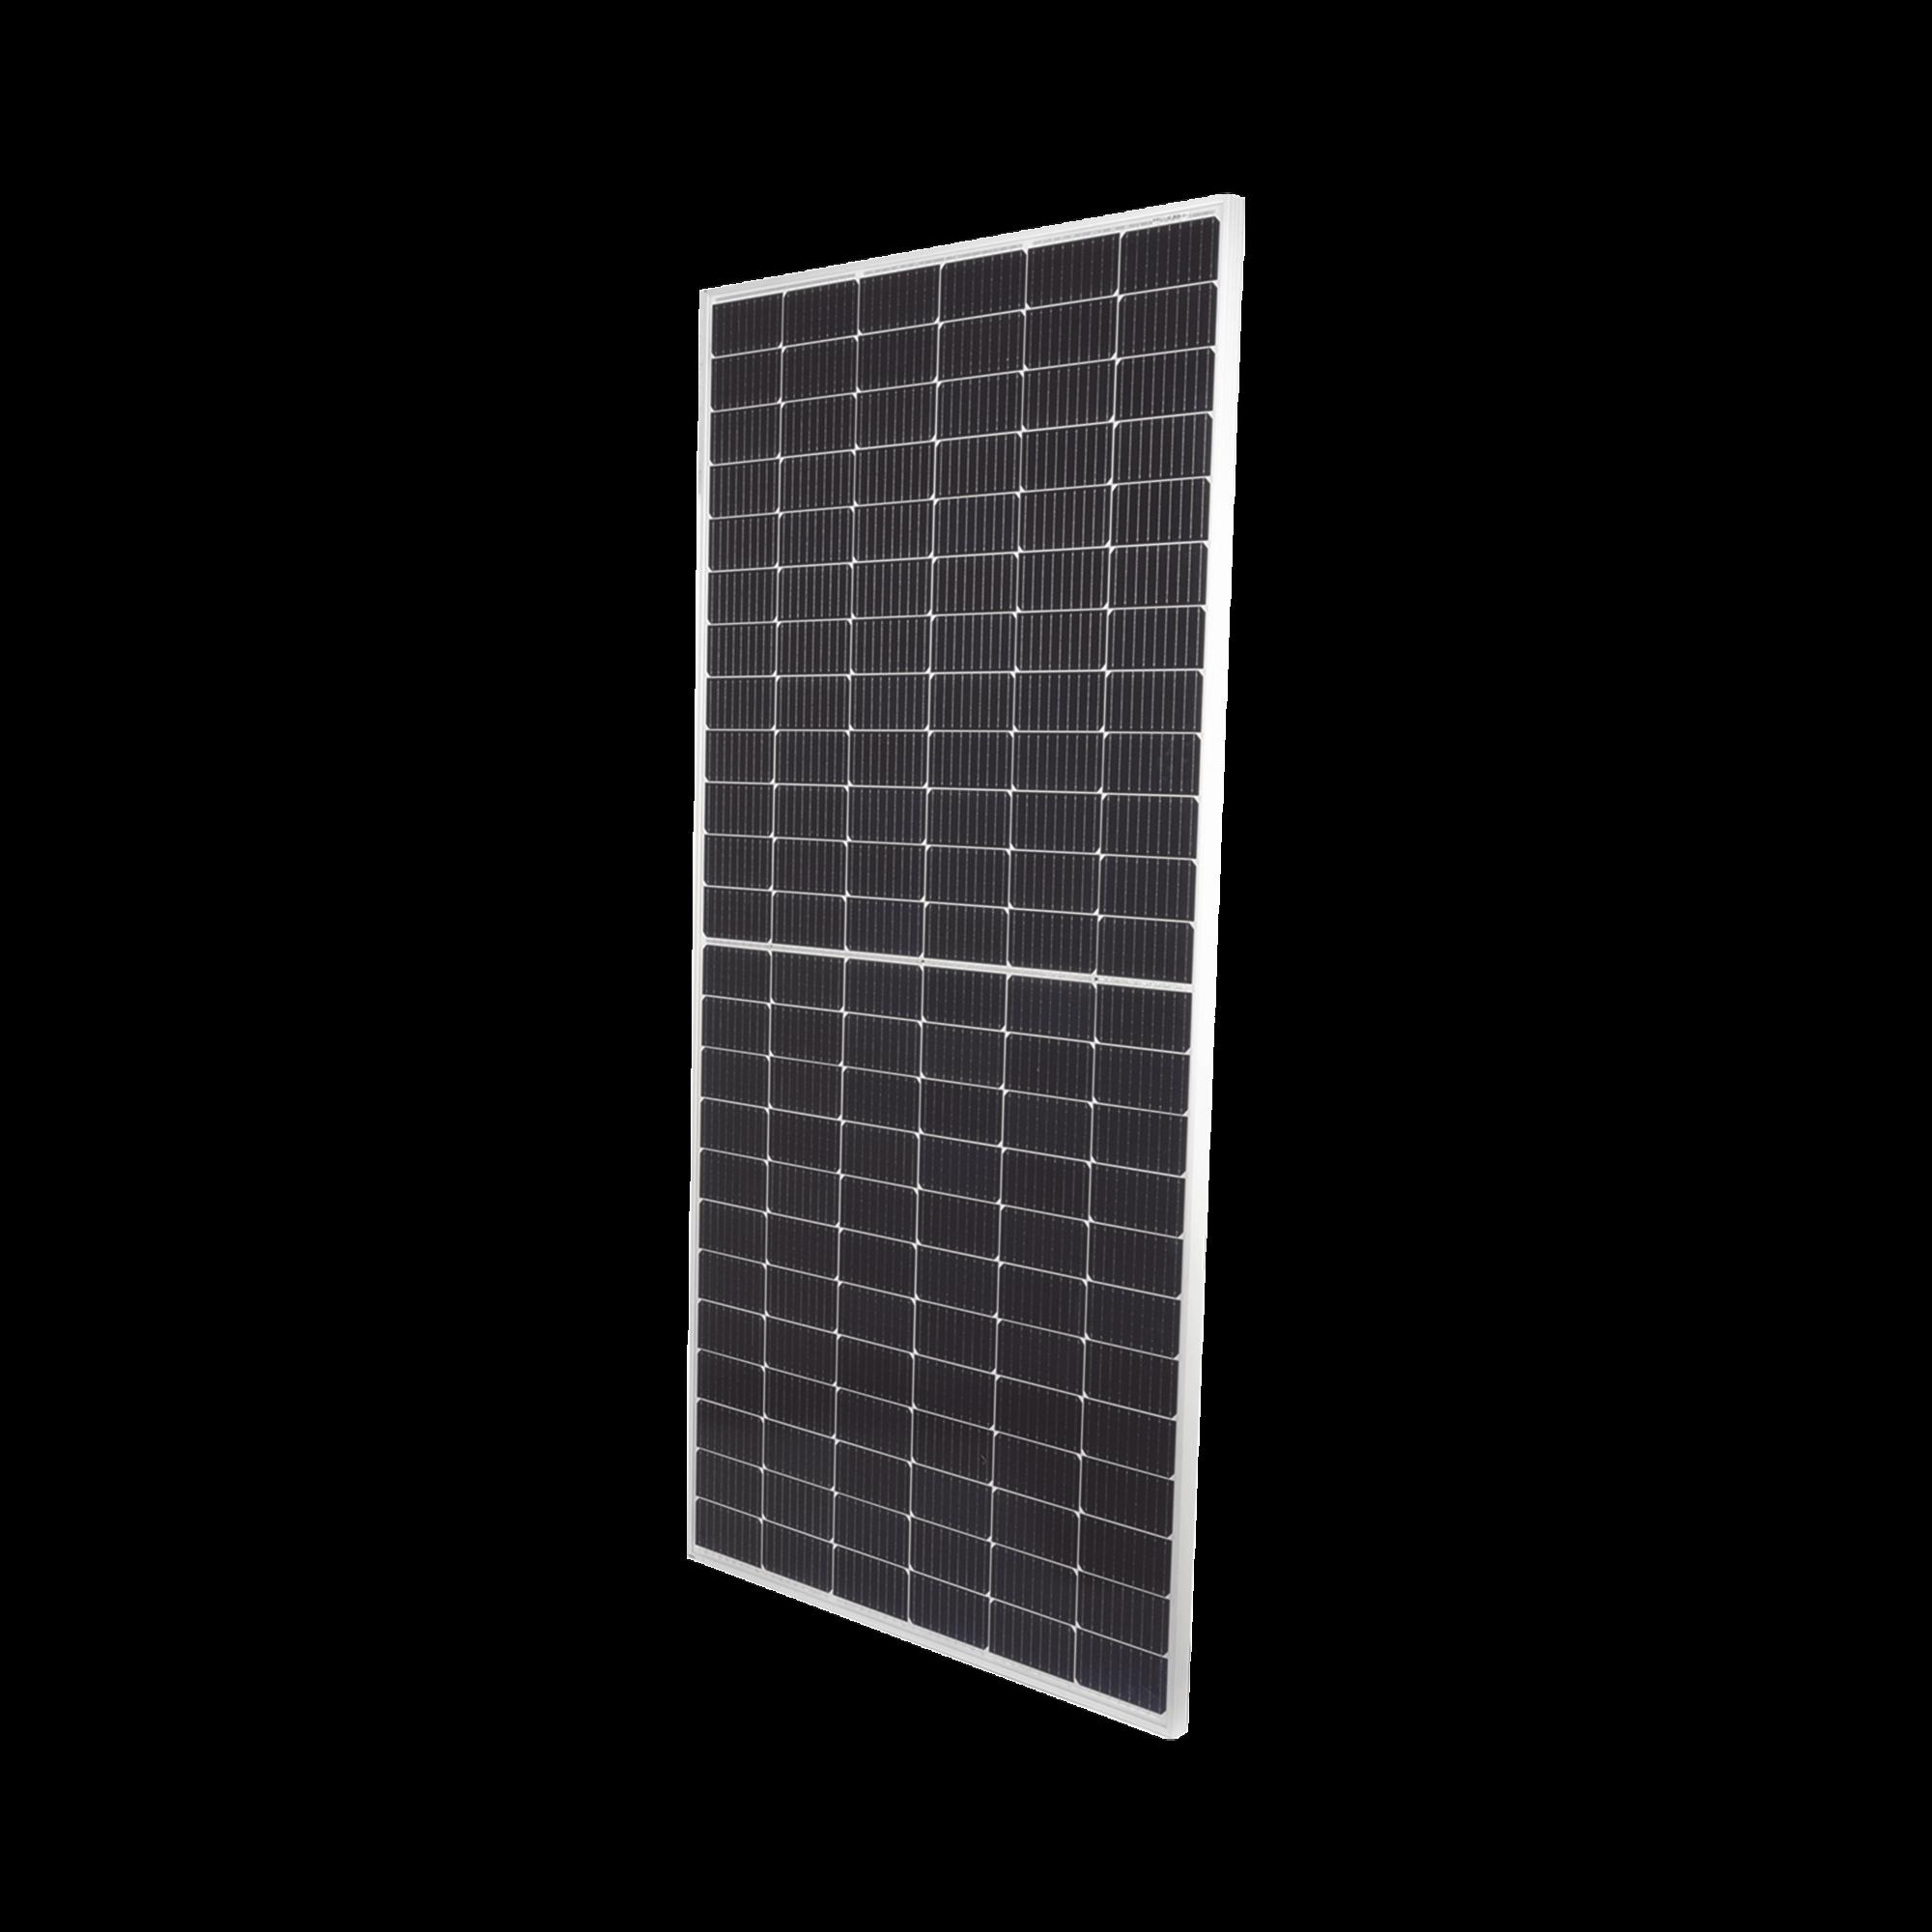 Modulo Solar EPCOM, 450 W, Monocristalino, 144 Celdas con 9 Bus Bar de Grado A